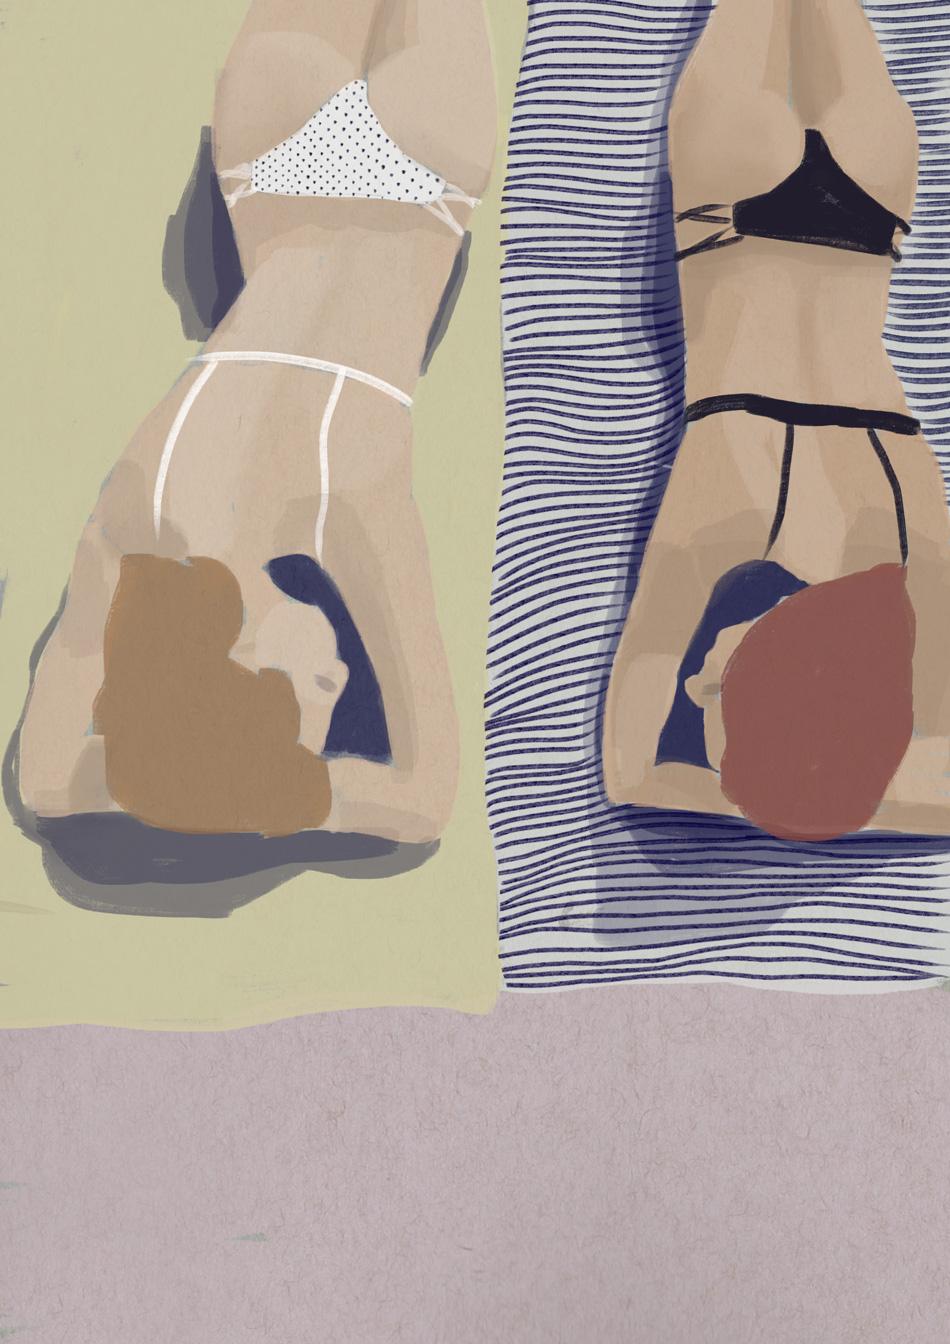 Life's-A-Beach-VII-by-Paola-van-der-Hulst